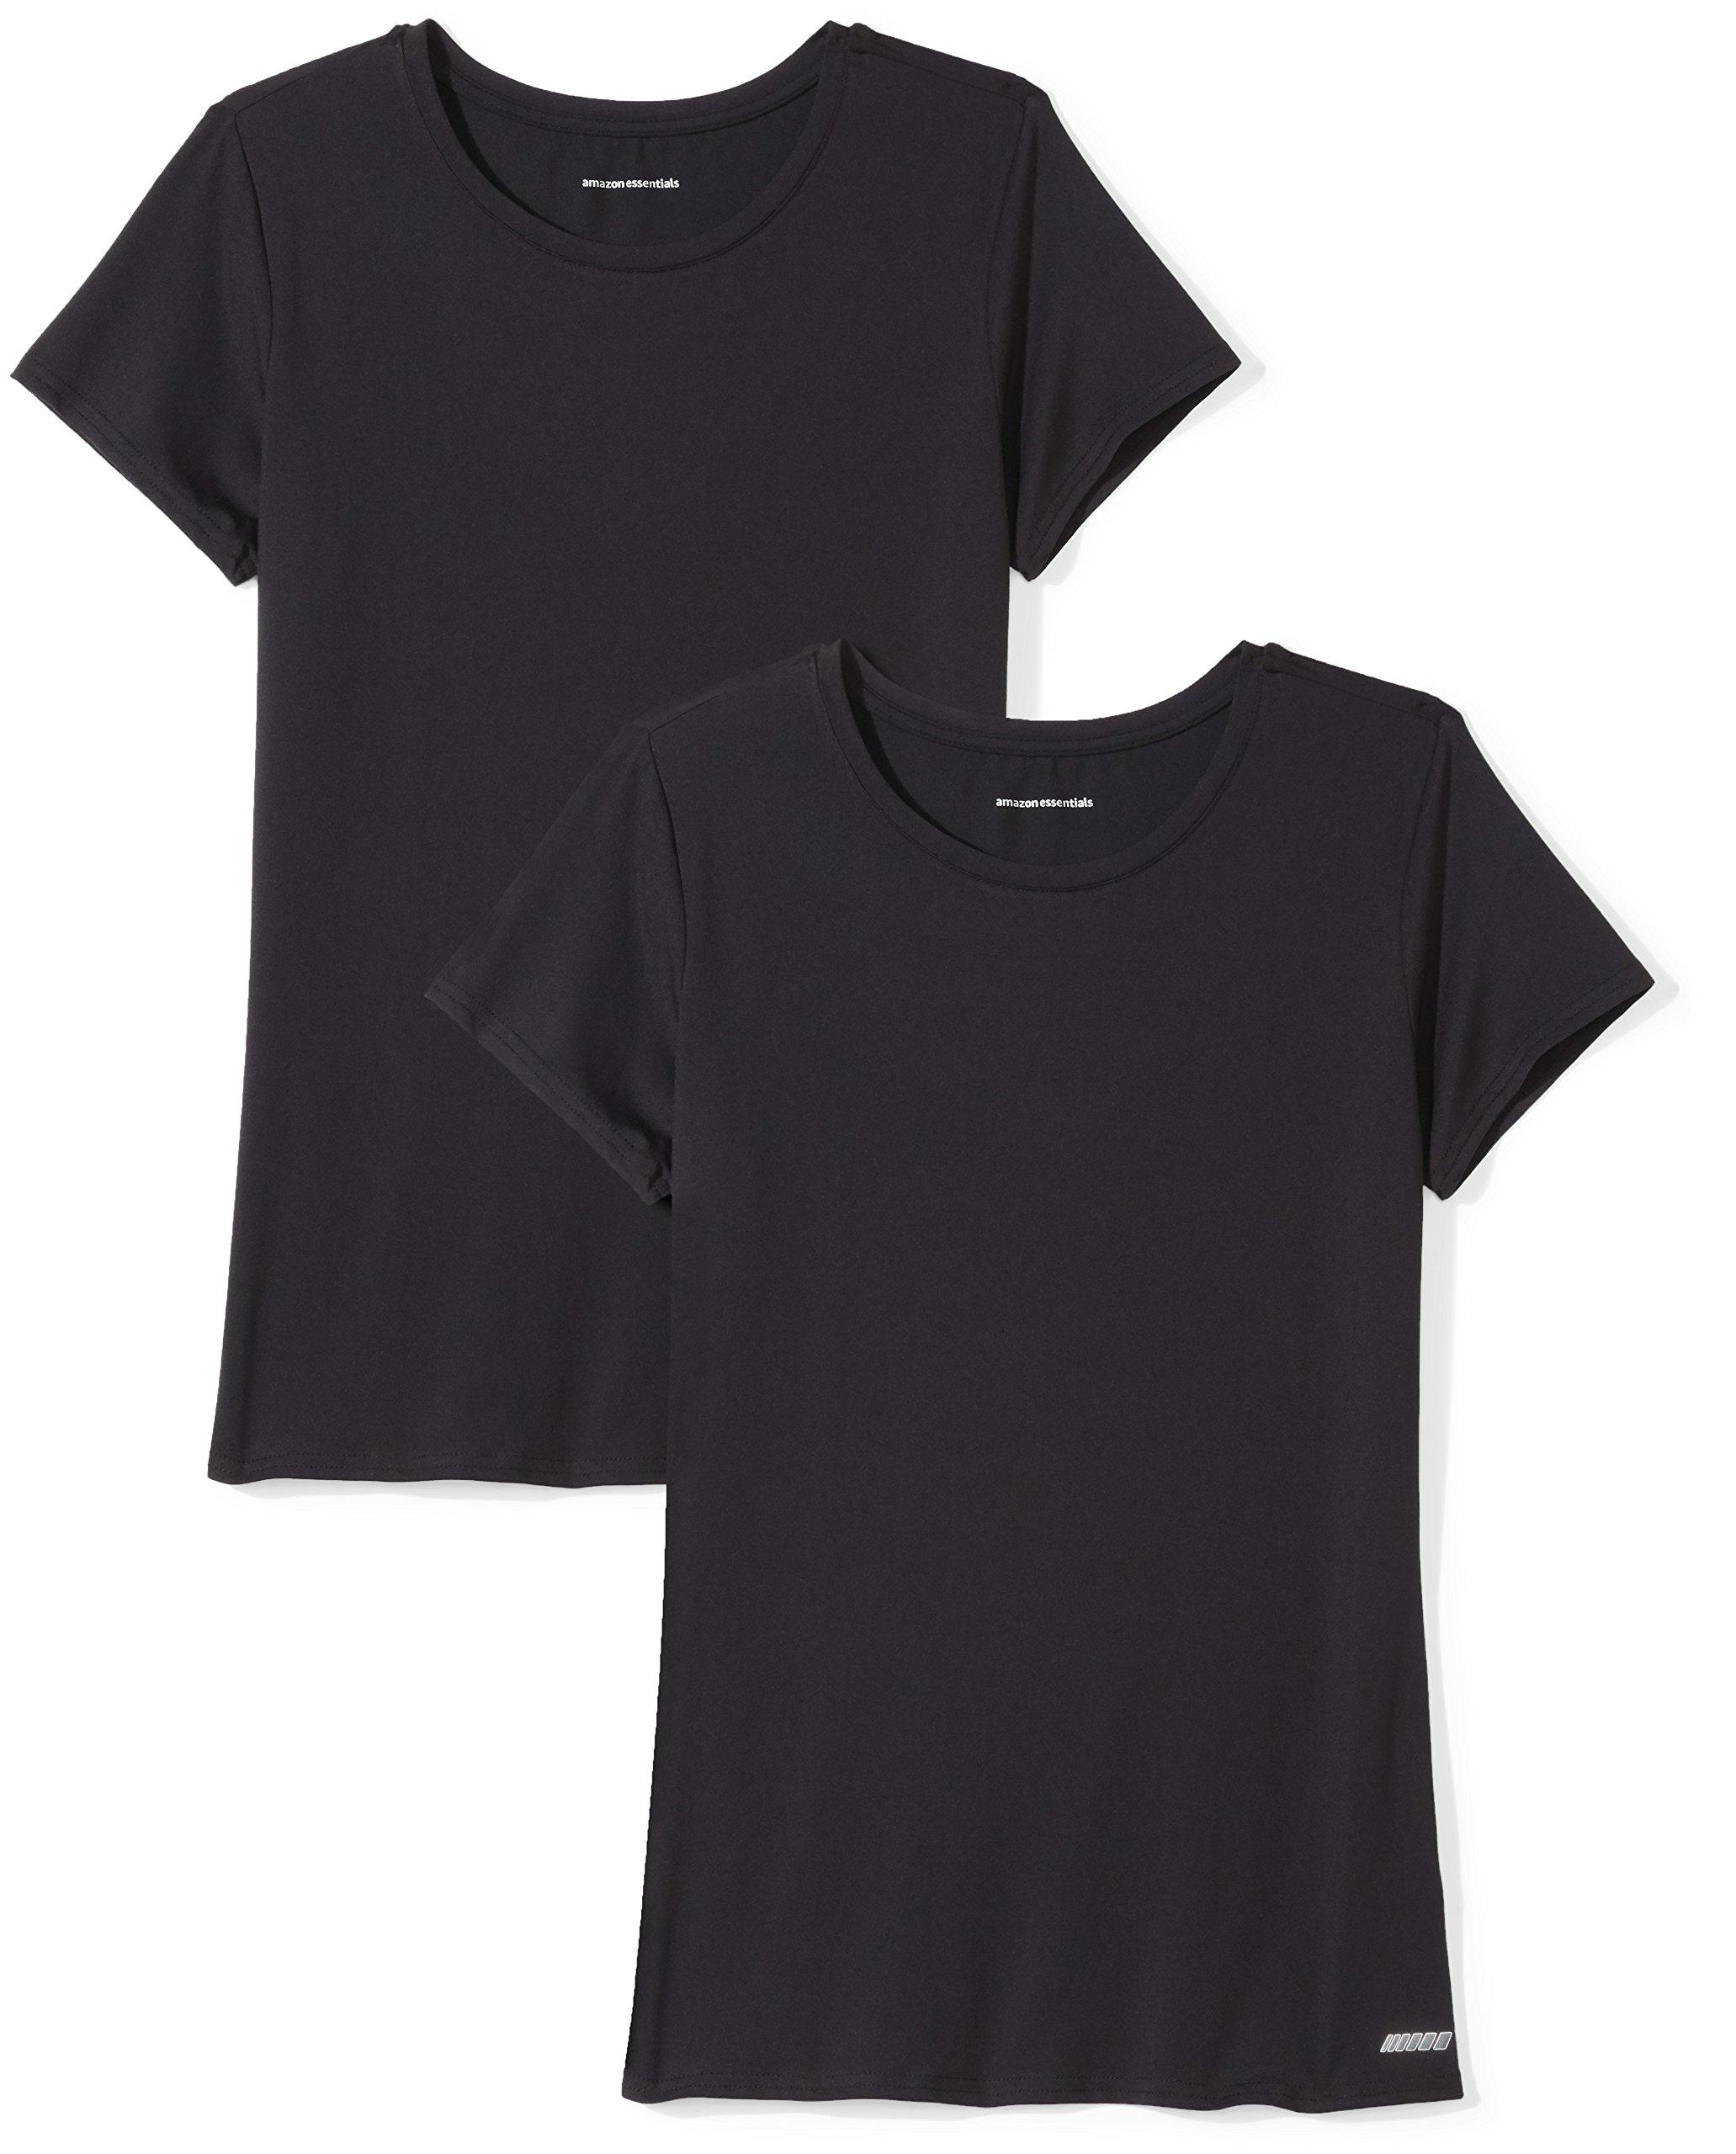 Amazon Essentials Women's 2-Pack Tech Stretch Short-Sleeve Crewneck T-Shirt, -black/black, Medium